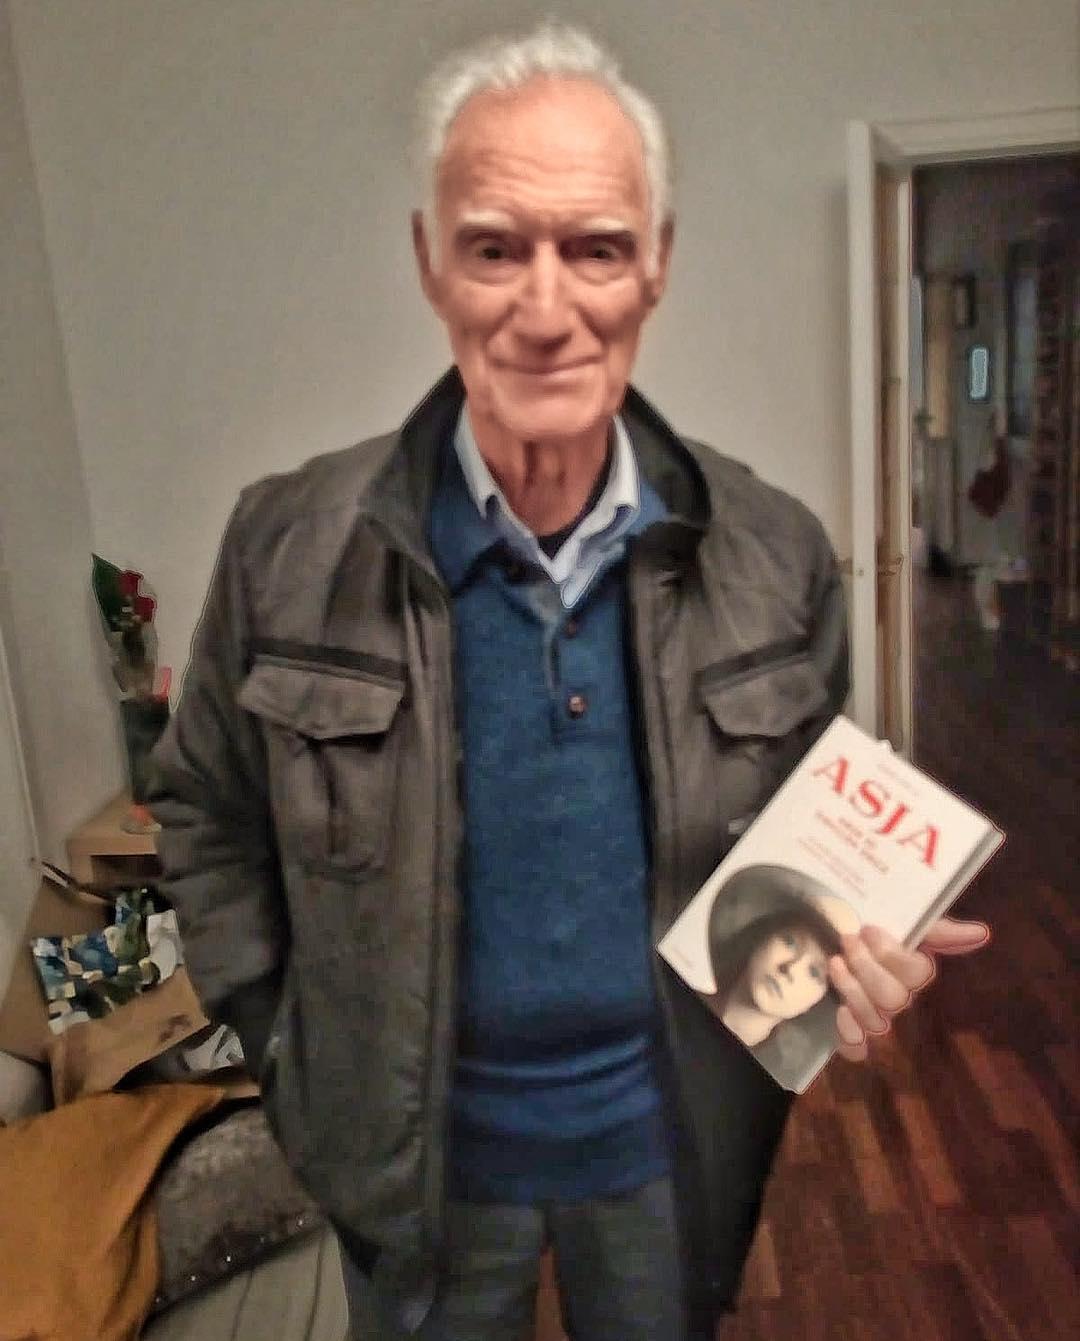 Es un honor saber que Juanma Ruiz de Erenchun va a conocer a #asjalacis [gracias a @laura_barcelona8 🤗]